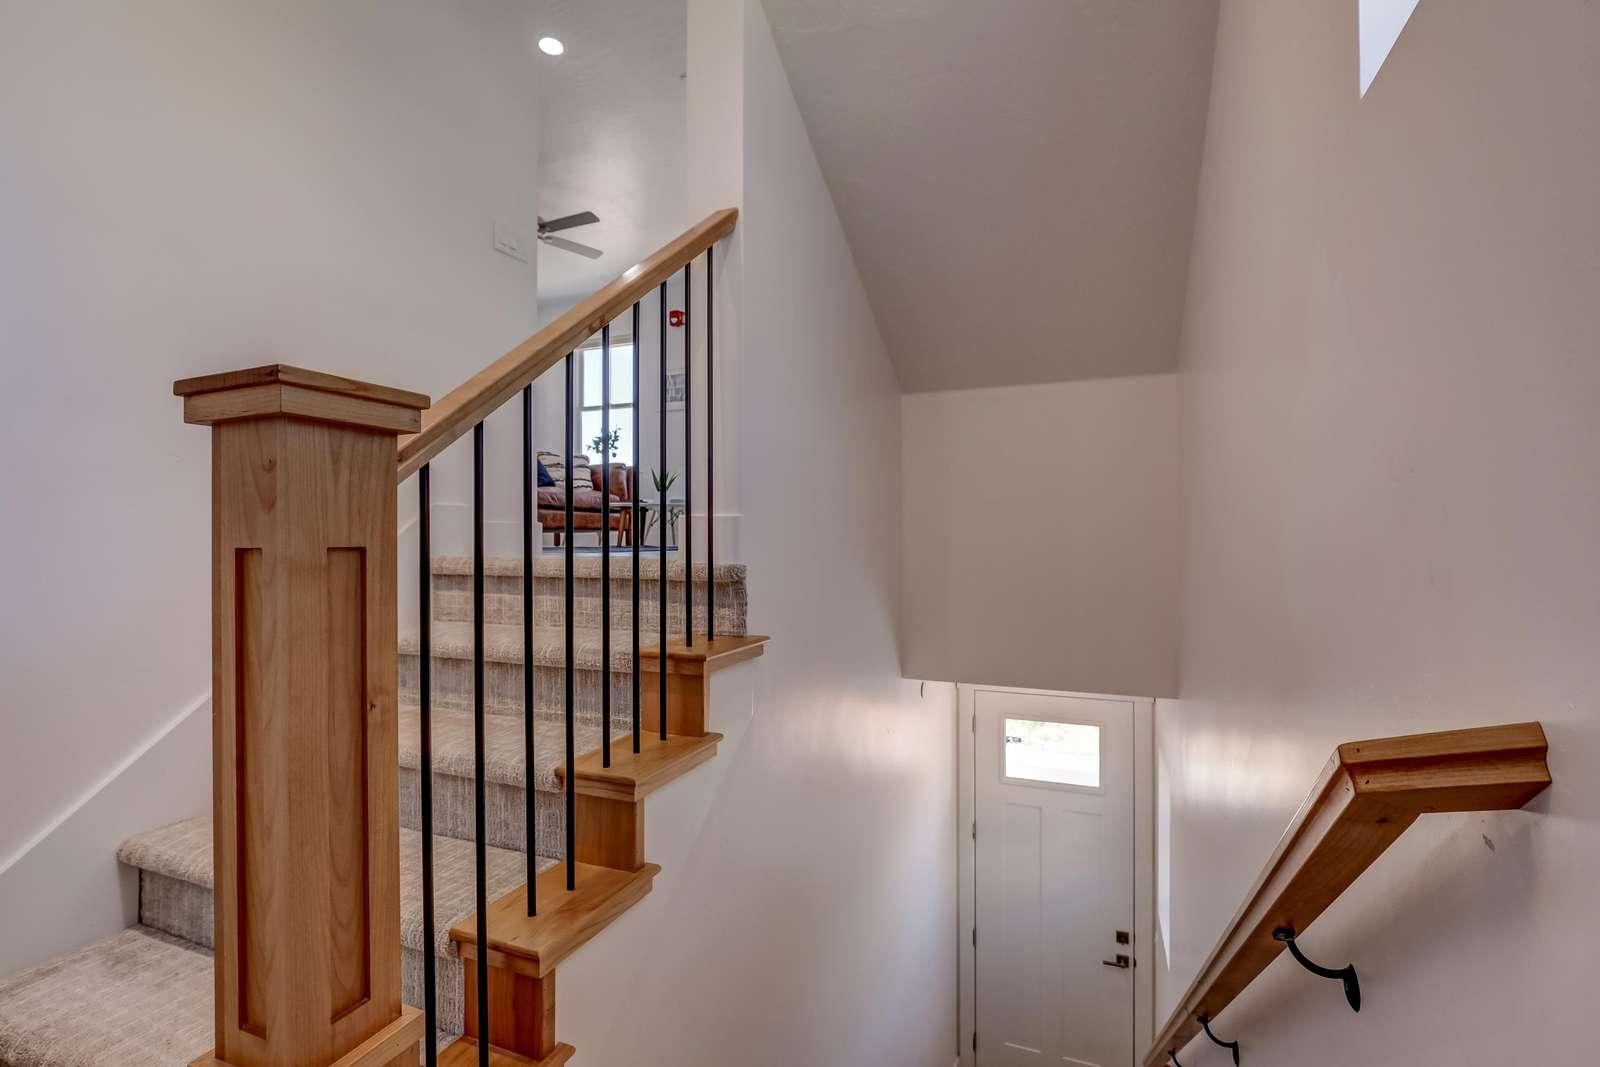 stairway to casita